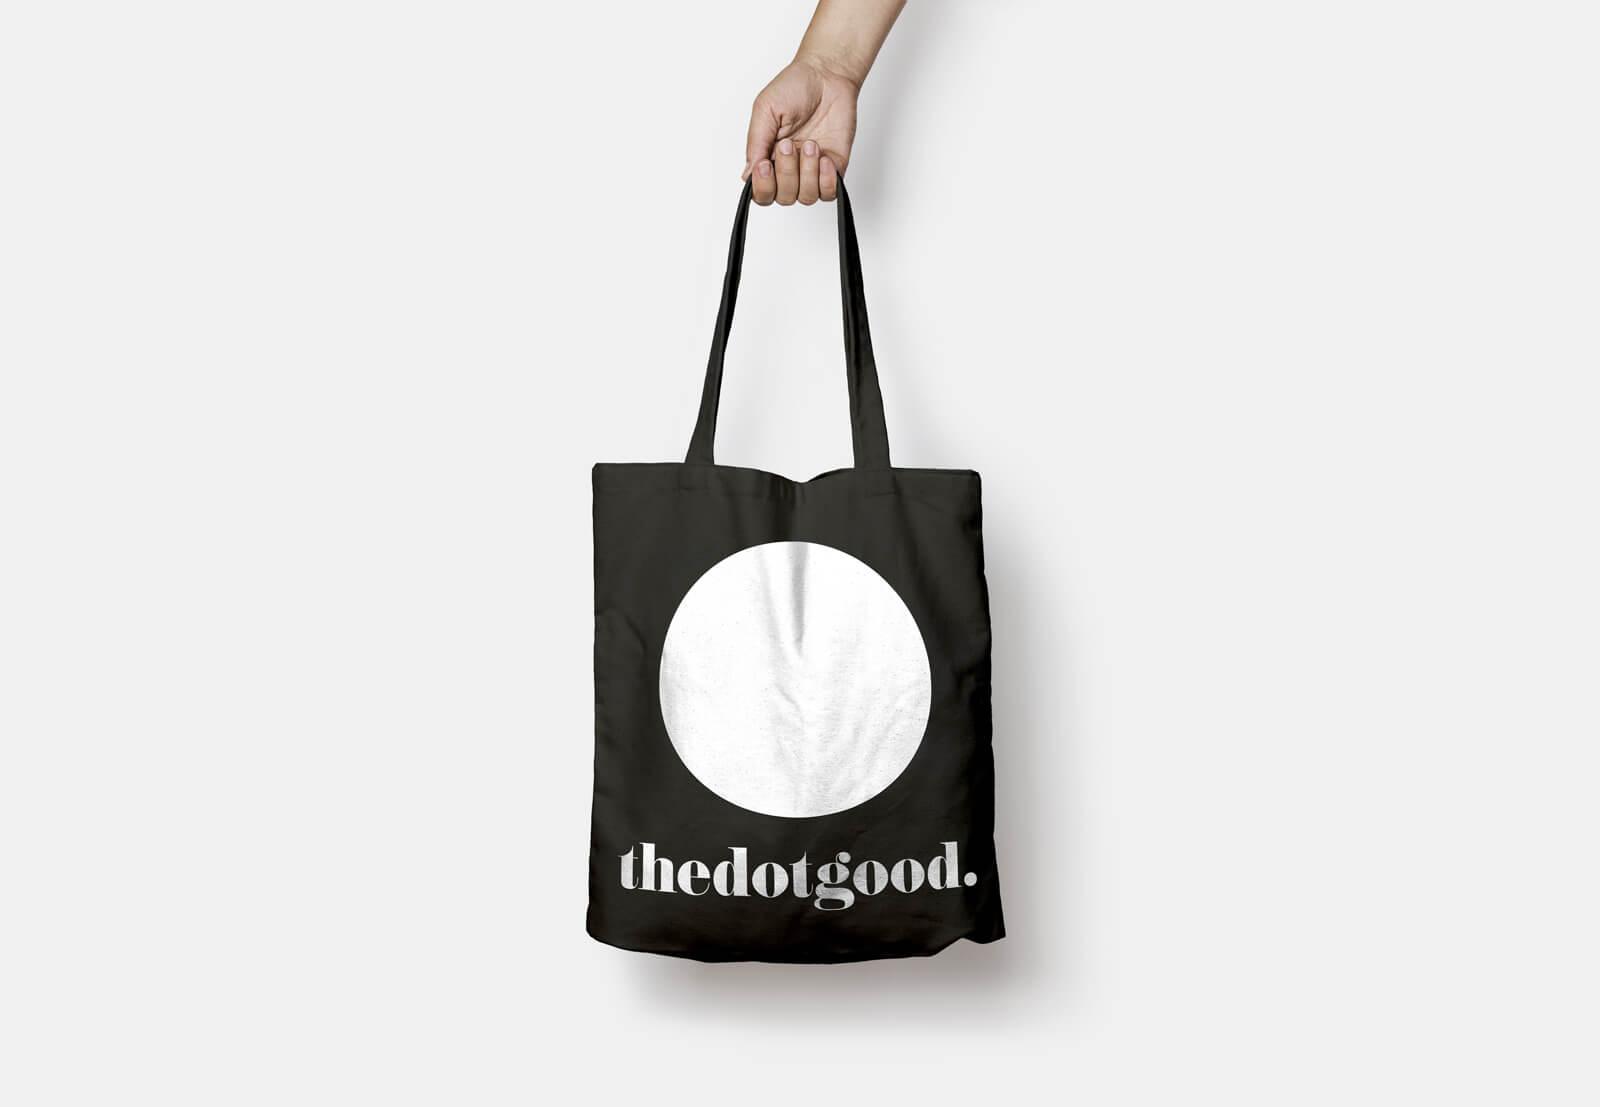 lezardscreation agence communication publicite vosges remiremont thedotgood lezardscreation thedotgood tote bag mockup blanc copie